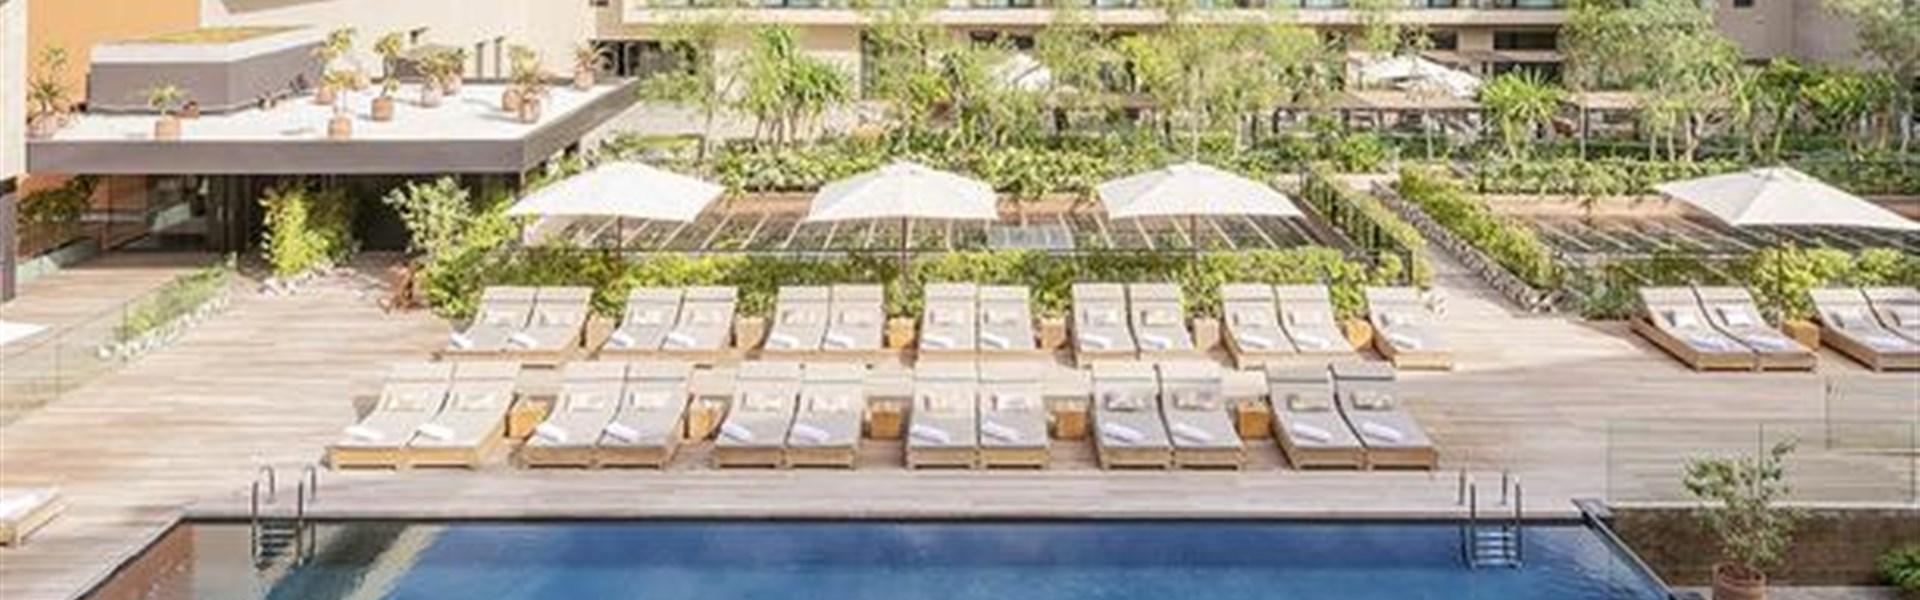 Marco Polo - Radisson Blu Marrakech, Carré Eden - Pohled na hotelové pokoje a na bazén.